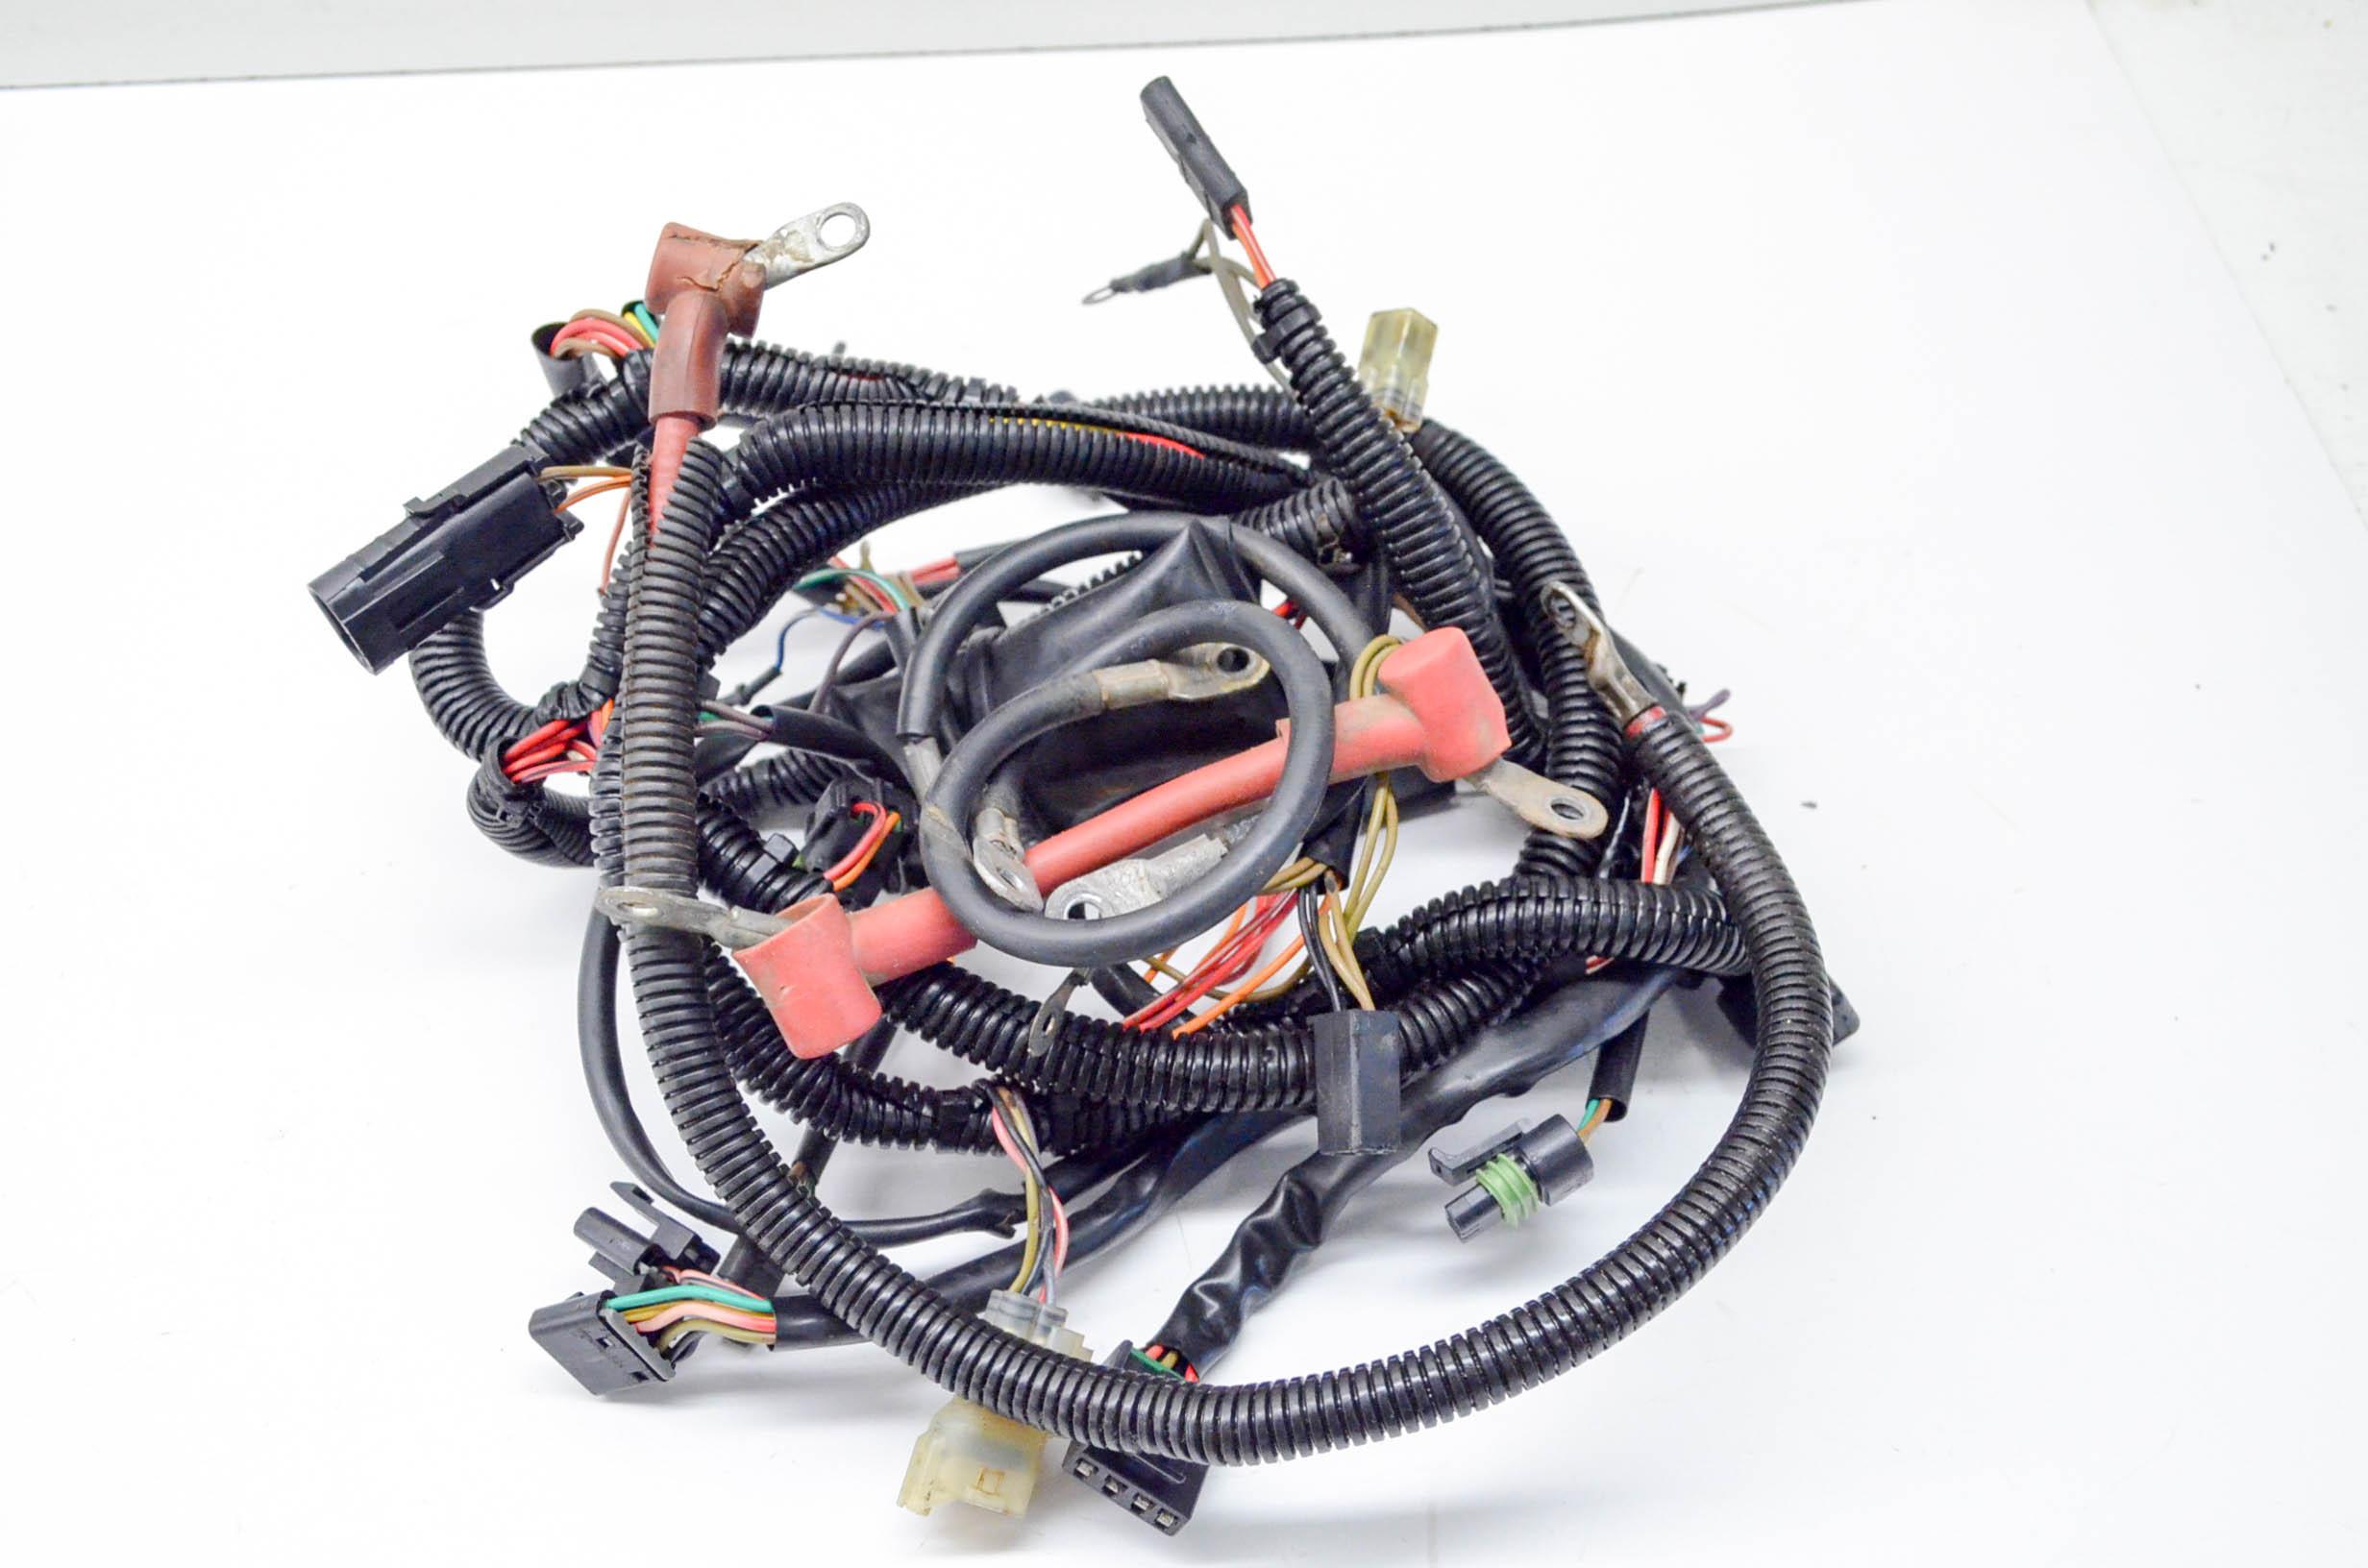 wiring harness rhode island wiring diagram Body Harness wiring harness rhode island all wiring diagram data06 polaris predator 500 wire harness electrical wiring ebay